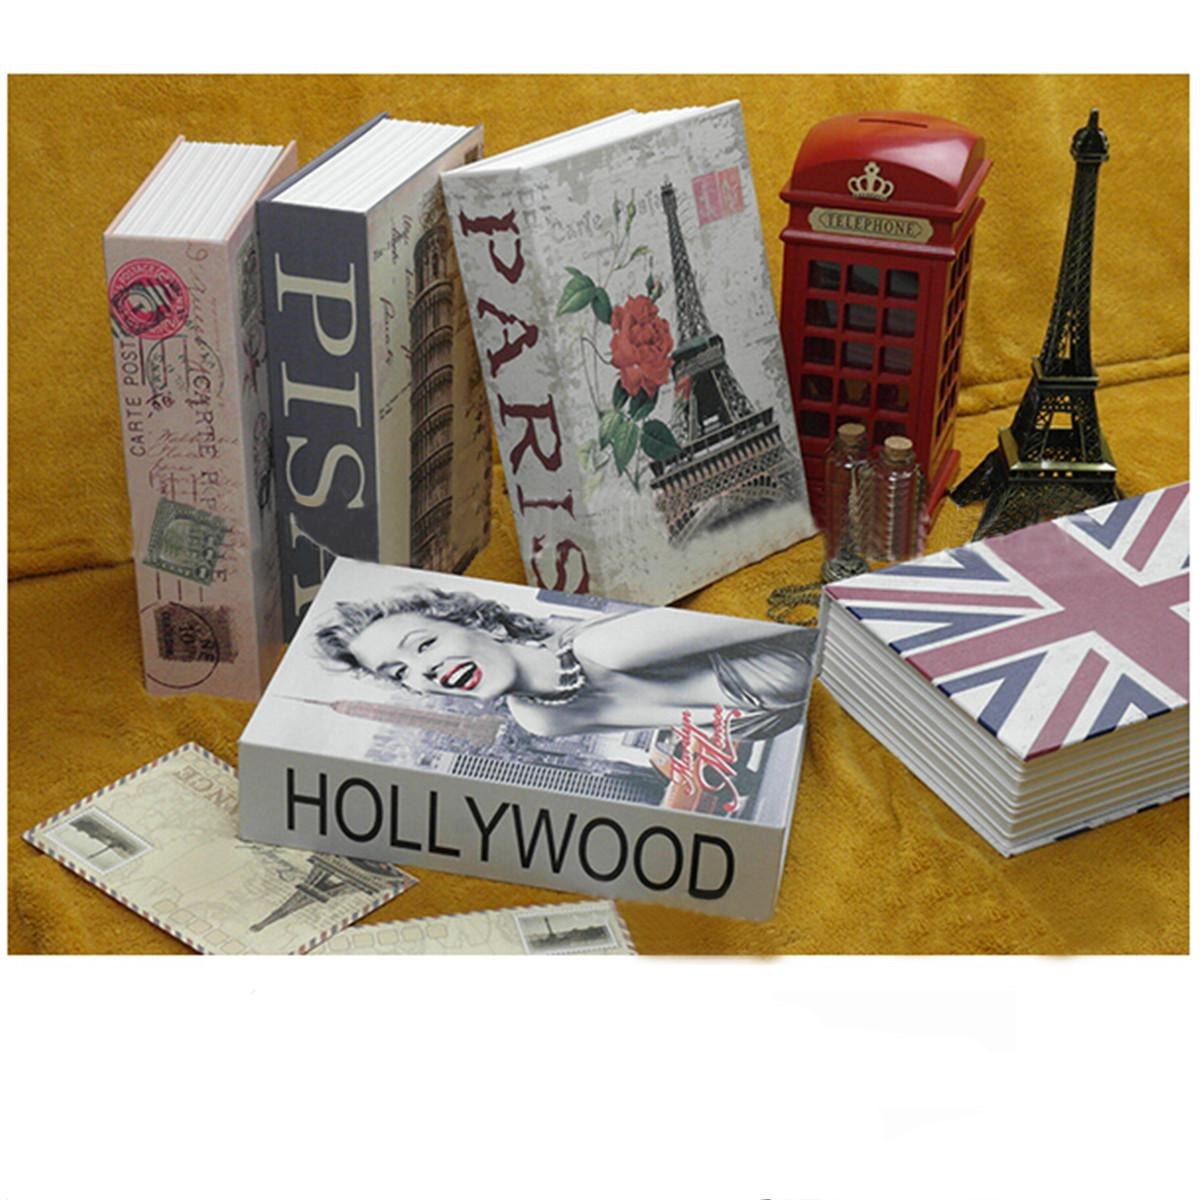 Security Mini Dictionary Safe Box Book Money Hide Secret Security Safe Lock Cash Money Coin Storage Jewelry Key Locker Kids Gift